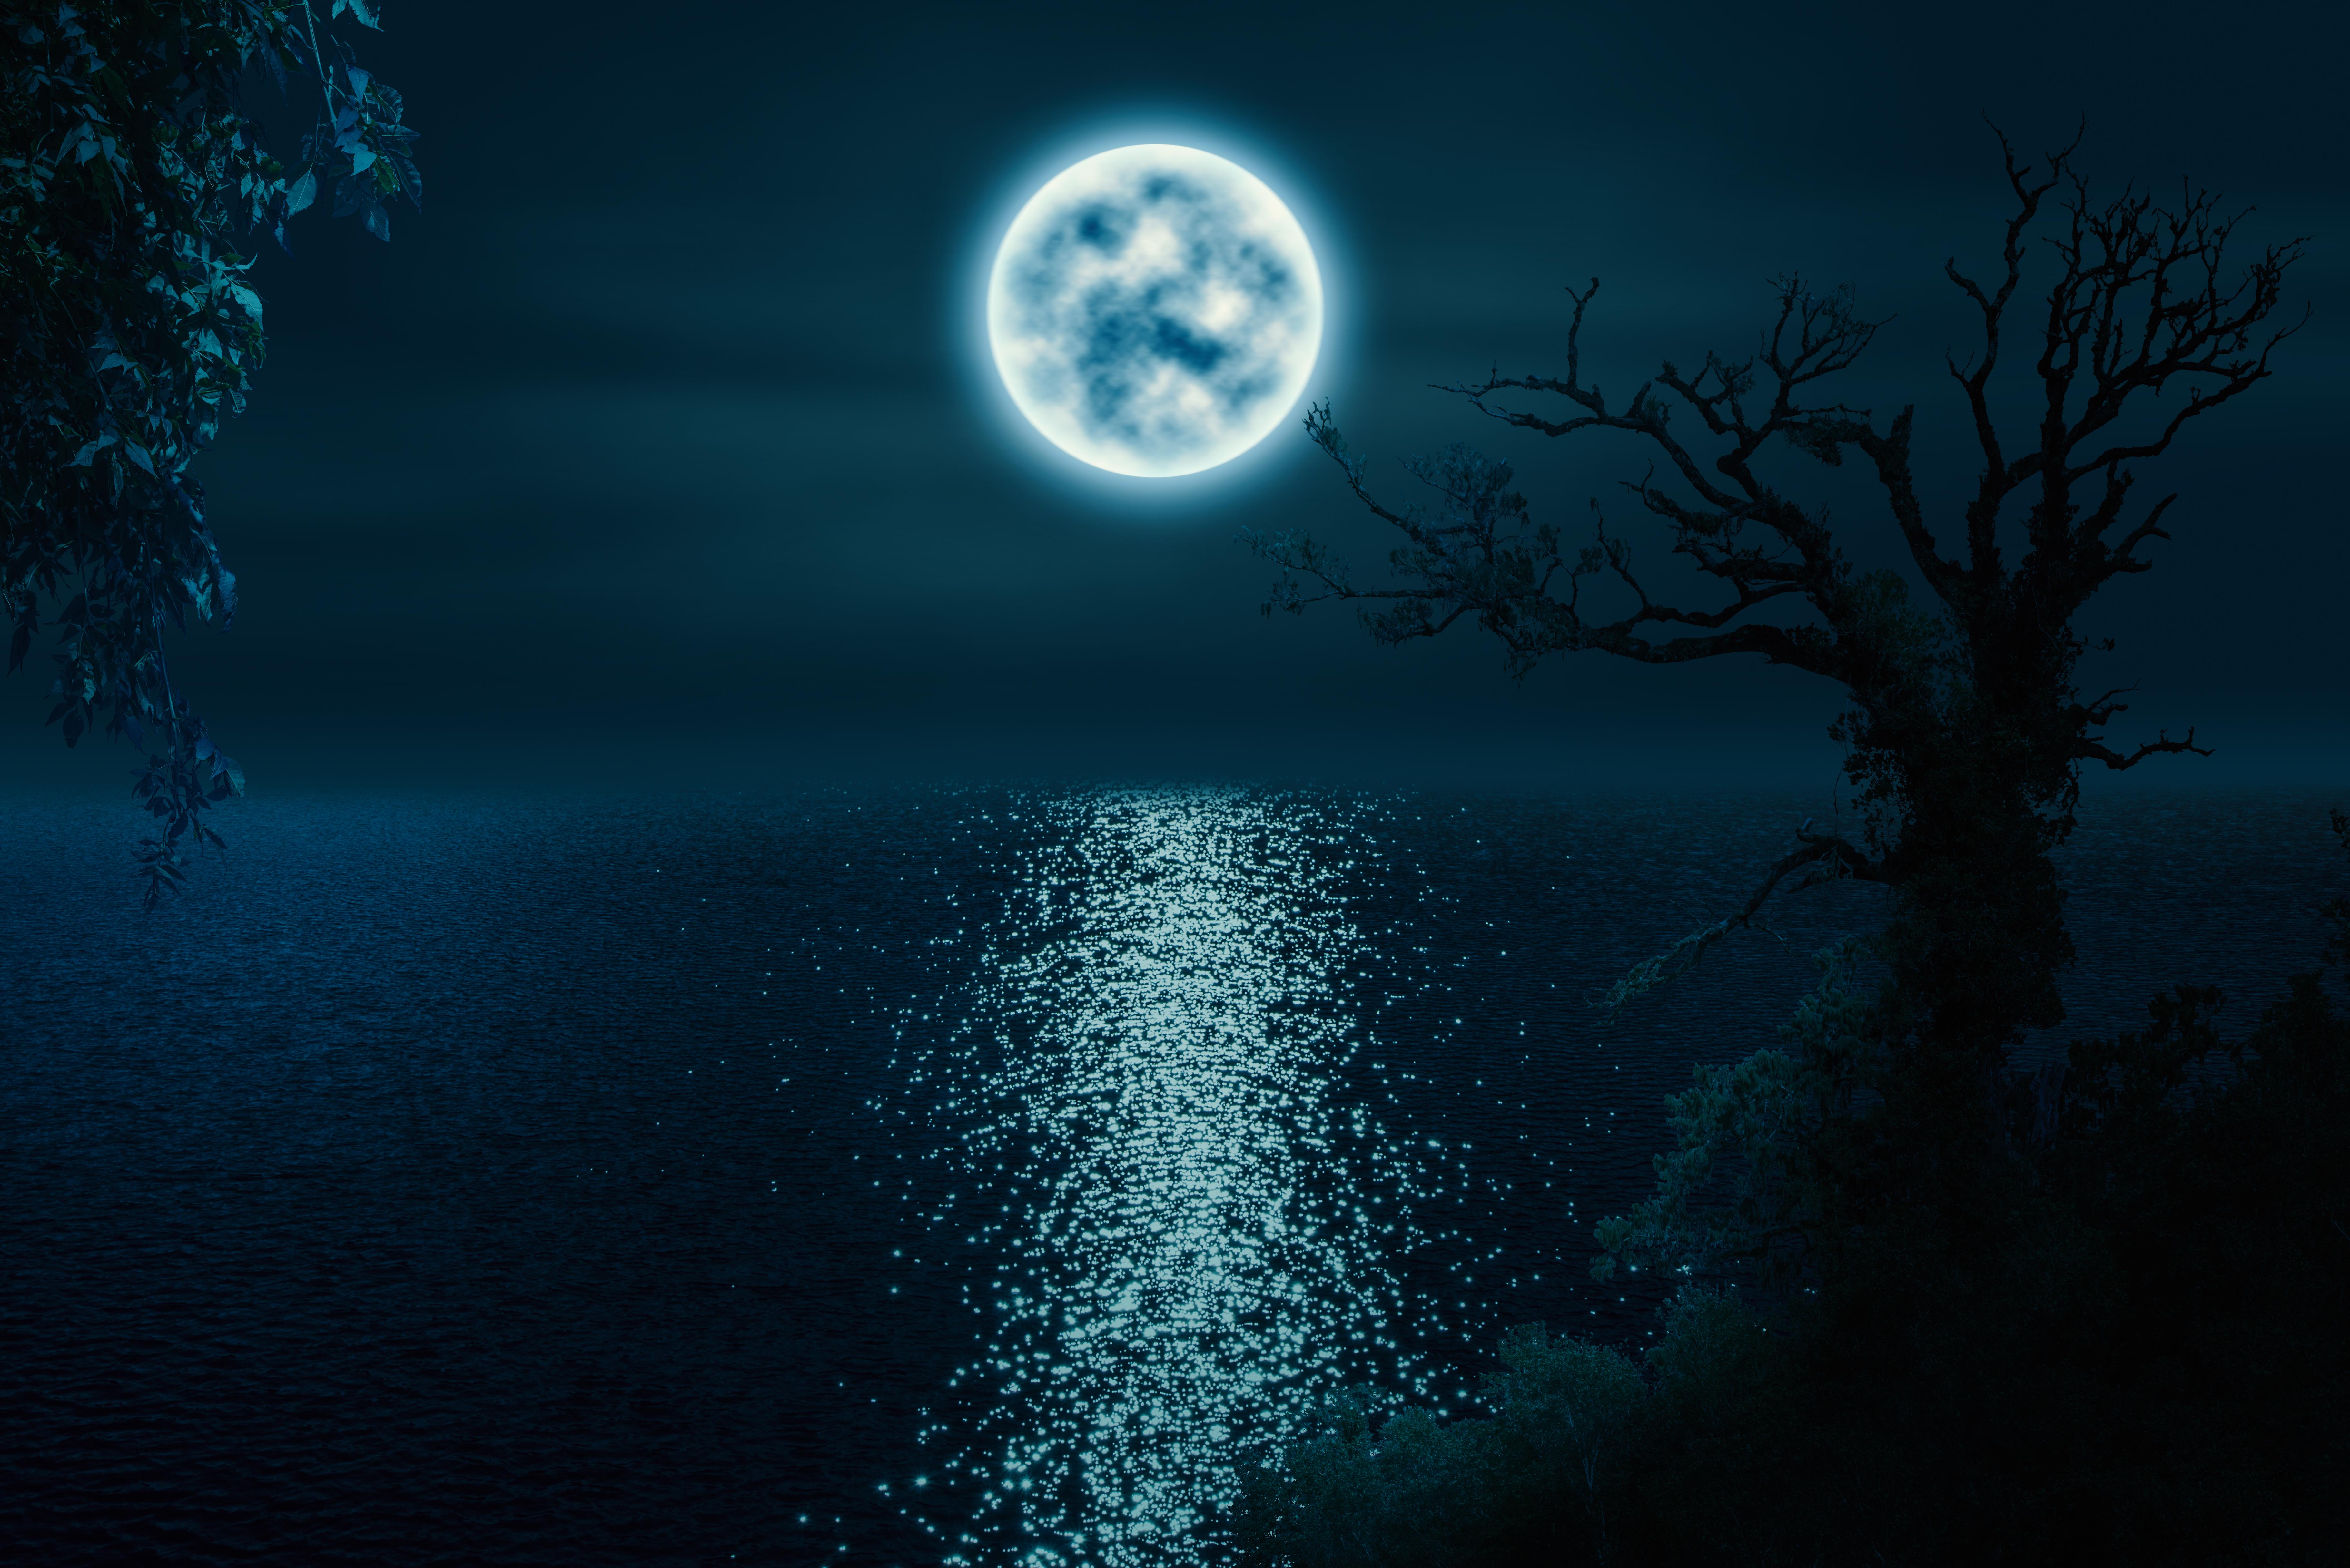 Free Images Trees Lake Moonlight Night Image Manipulation